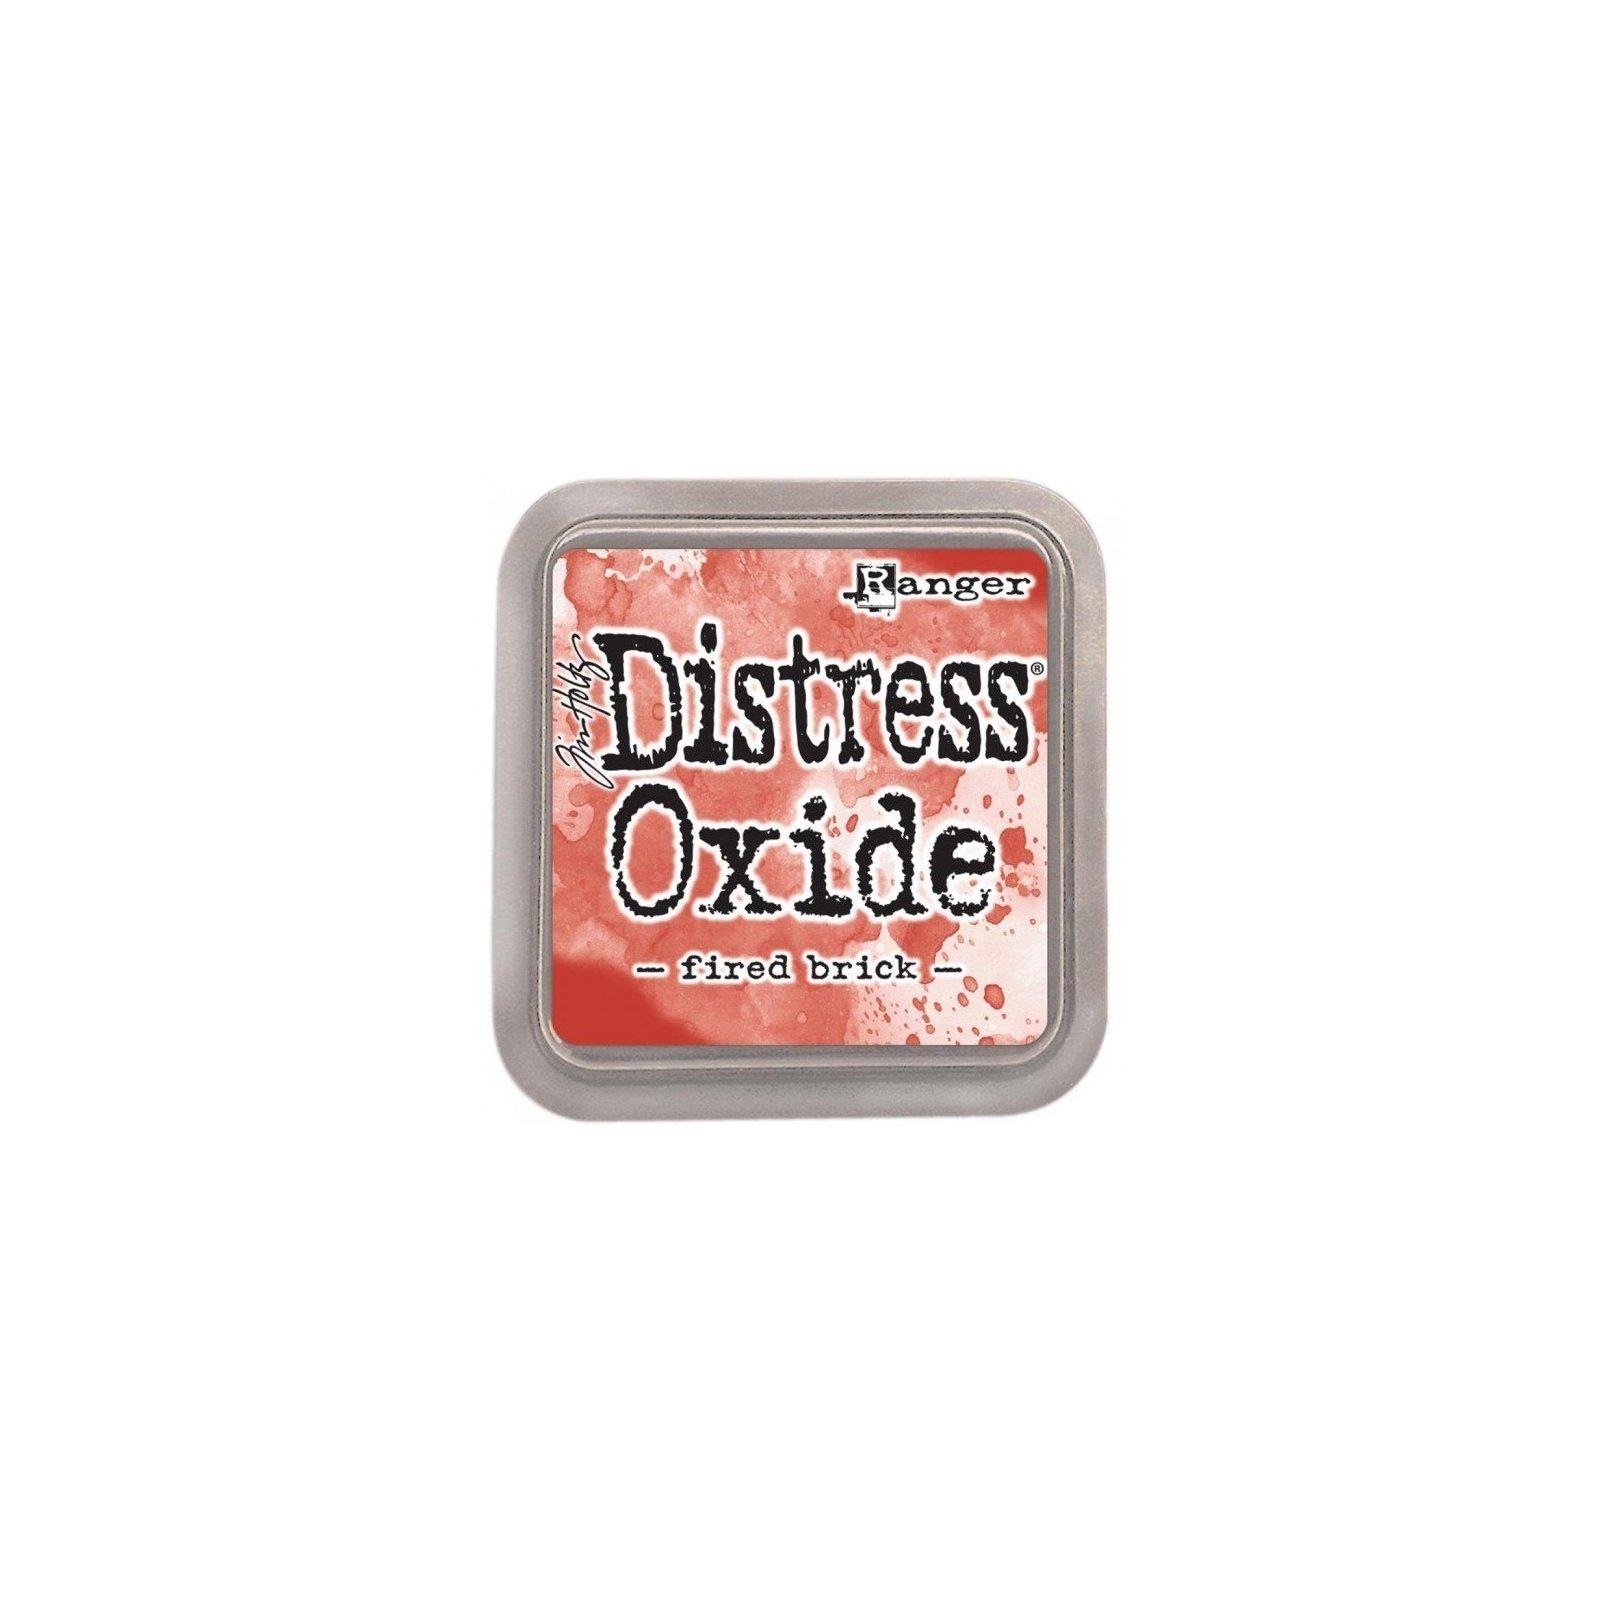 Grand encreur rouge Distress Oxide - Fired Brick - Ranger